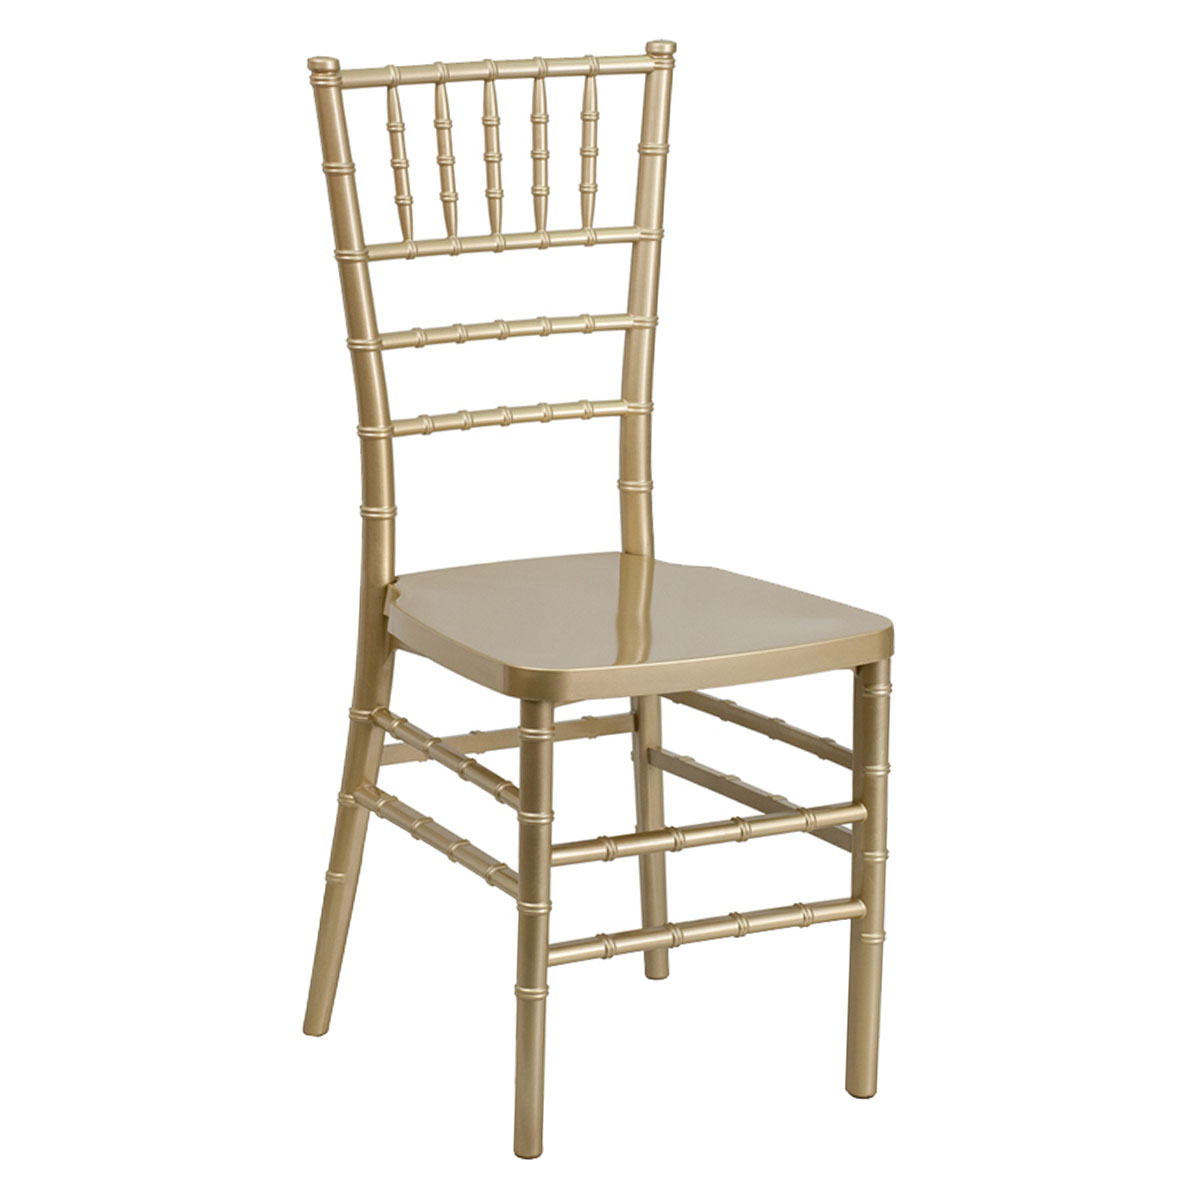 chaise-chiavari